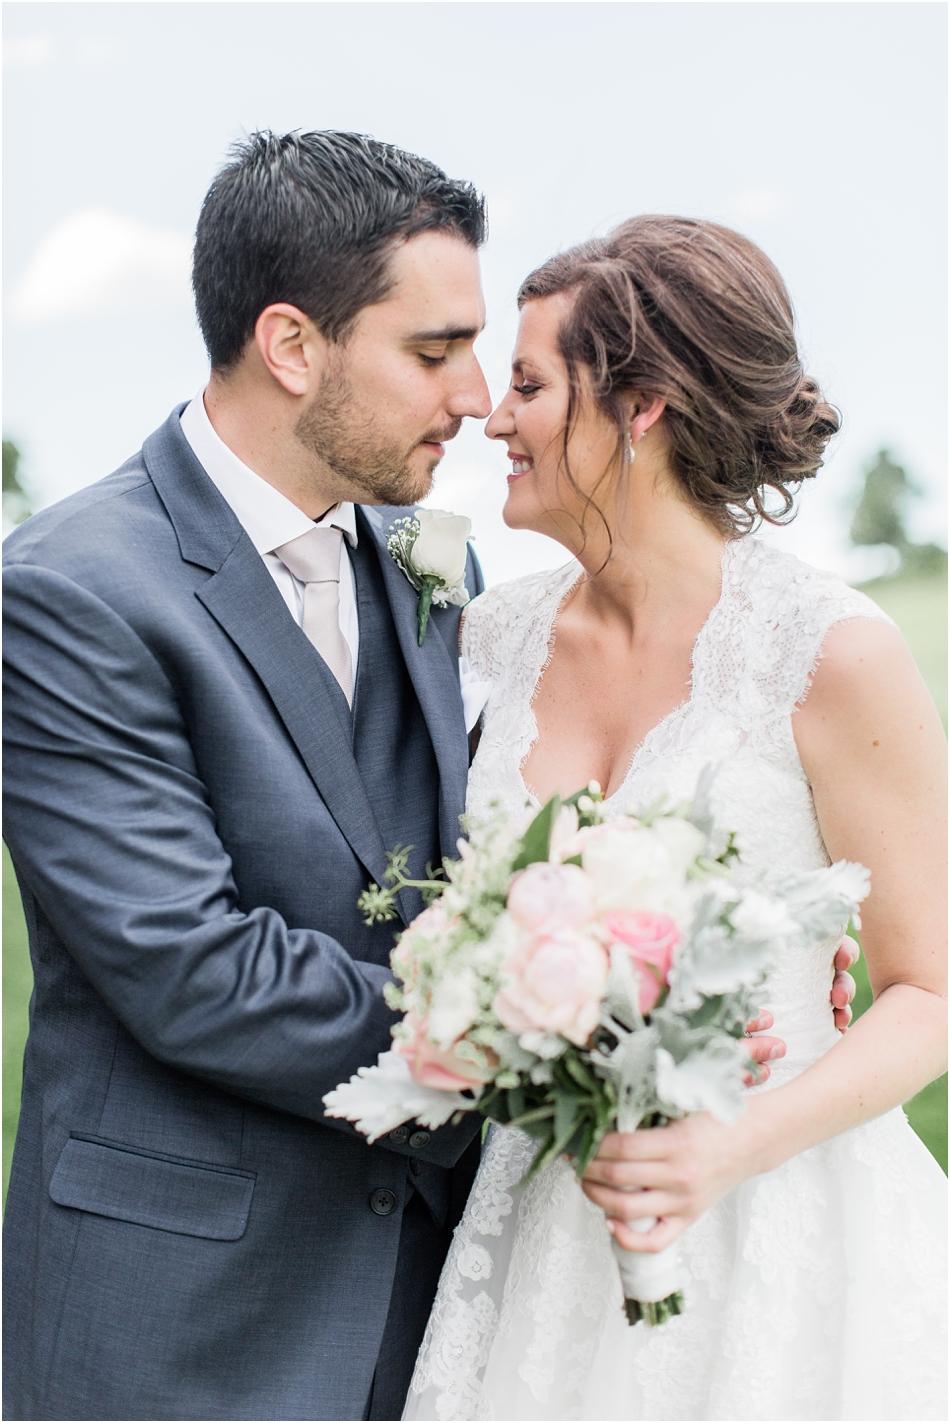 barn_at_gibbett_hill_groton_boston_massachusetts_cape_cod_new_england_wedding_photographer_Meredith_Jane_Photography_photo_1553.jpg